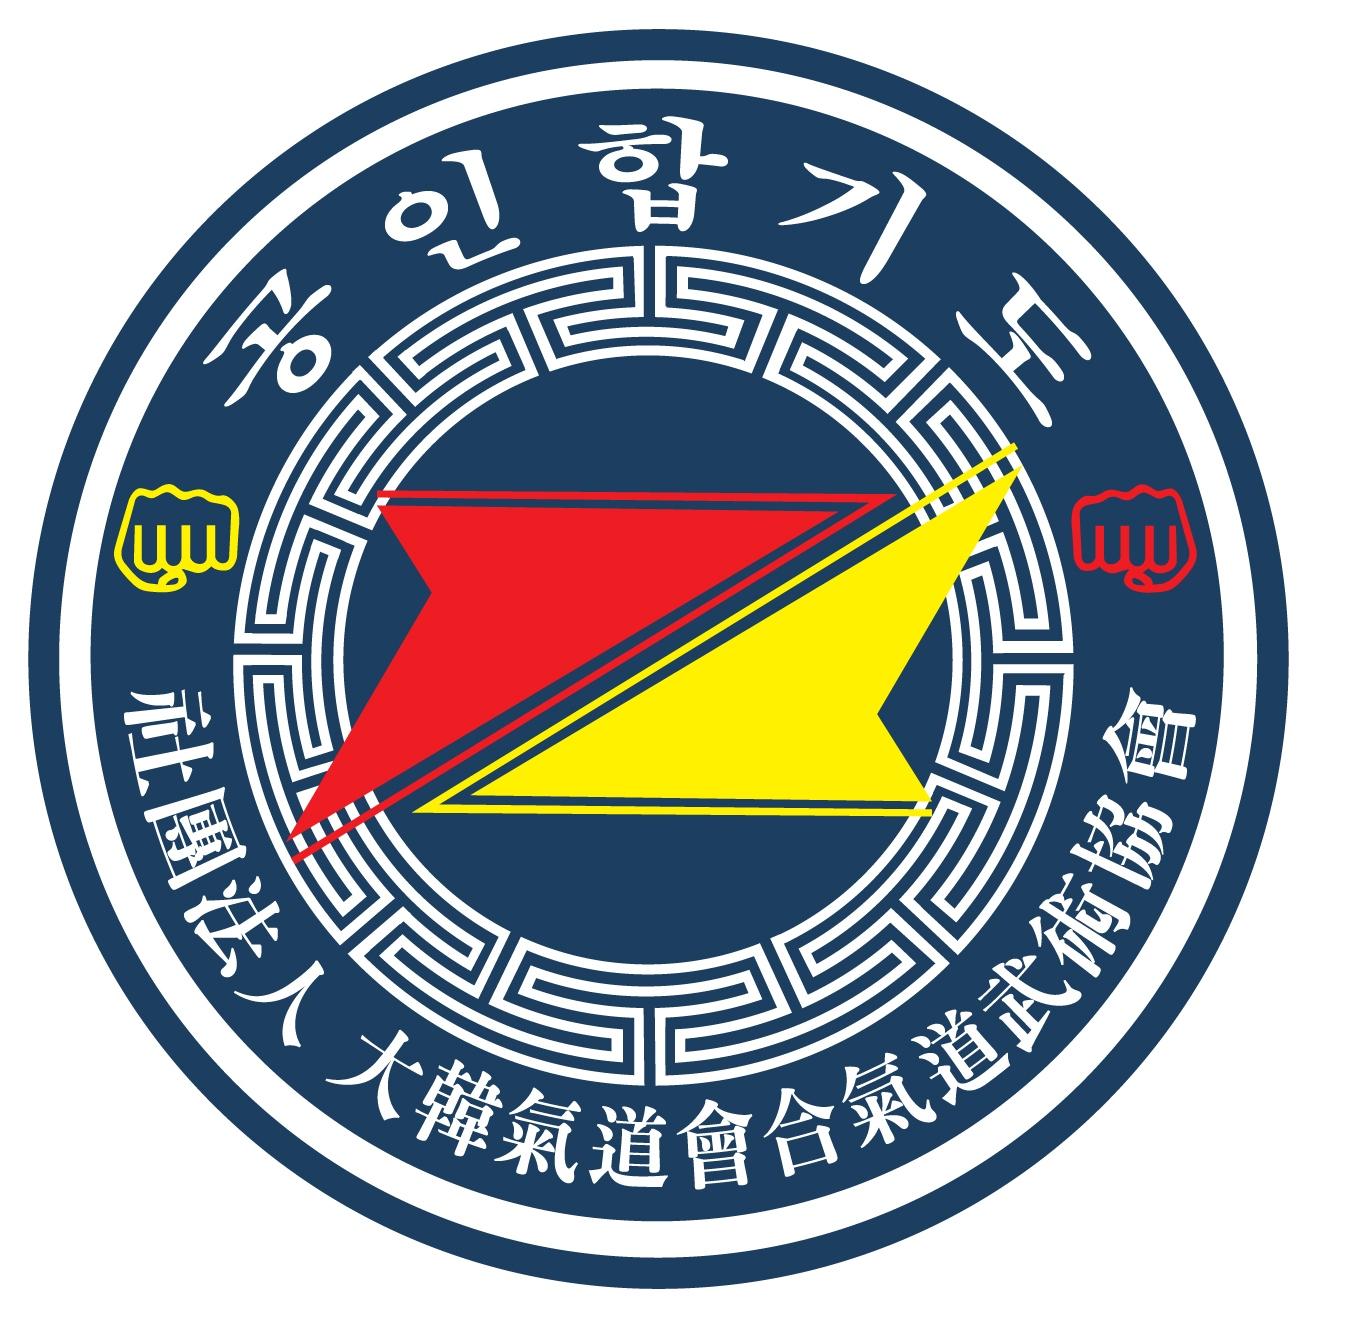 Korea KiDo Hwe (Hapkido) Association (KIDO) World's oldest Korean Martial Arts association.